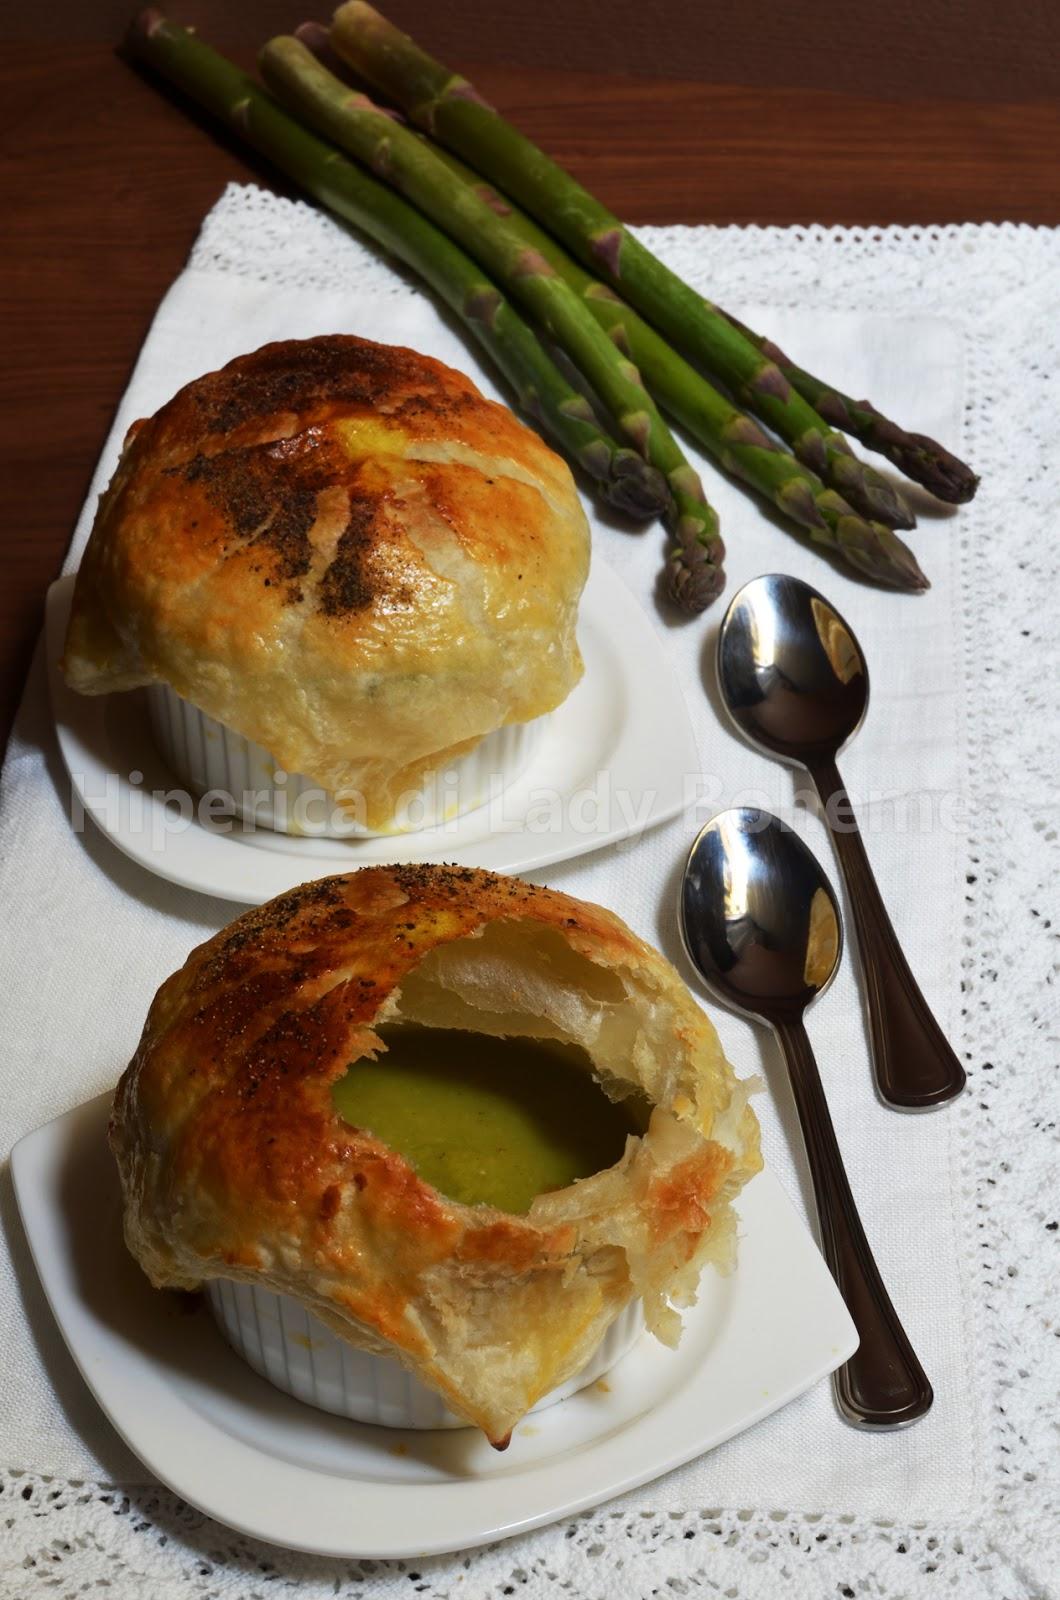 hiperica_lady_boheme_blog_di_cucina_ricette_gustose_facili_veloci_crema_di_asparagi_in_crosta_1